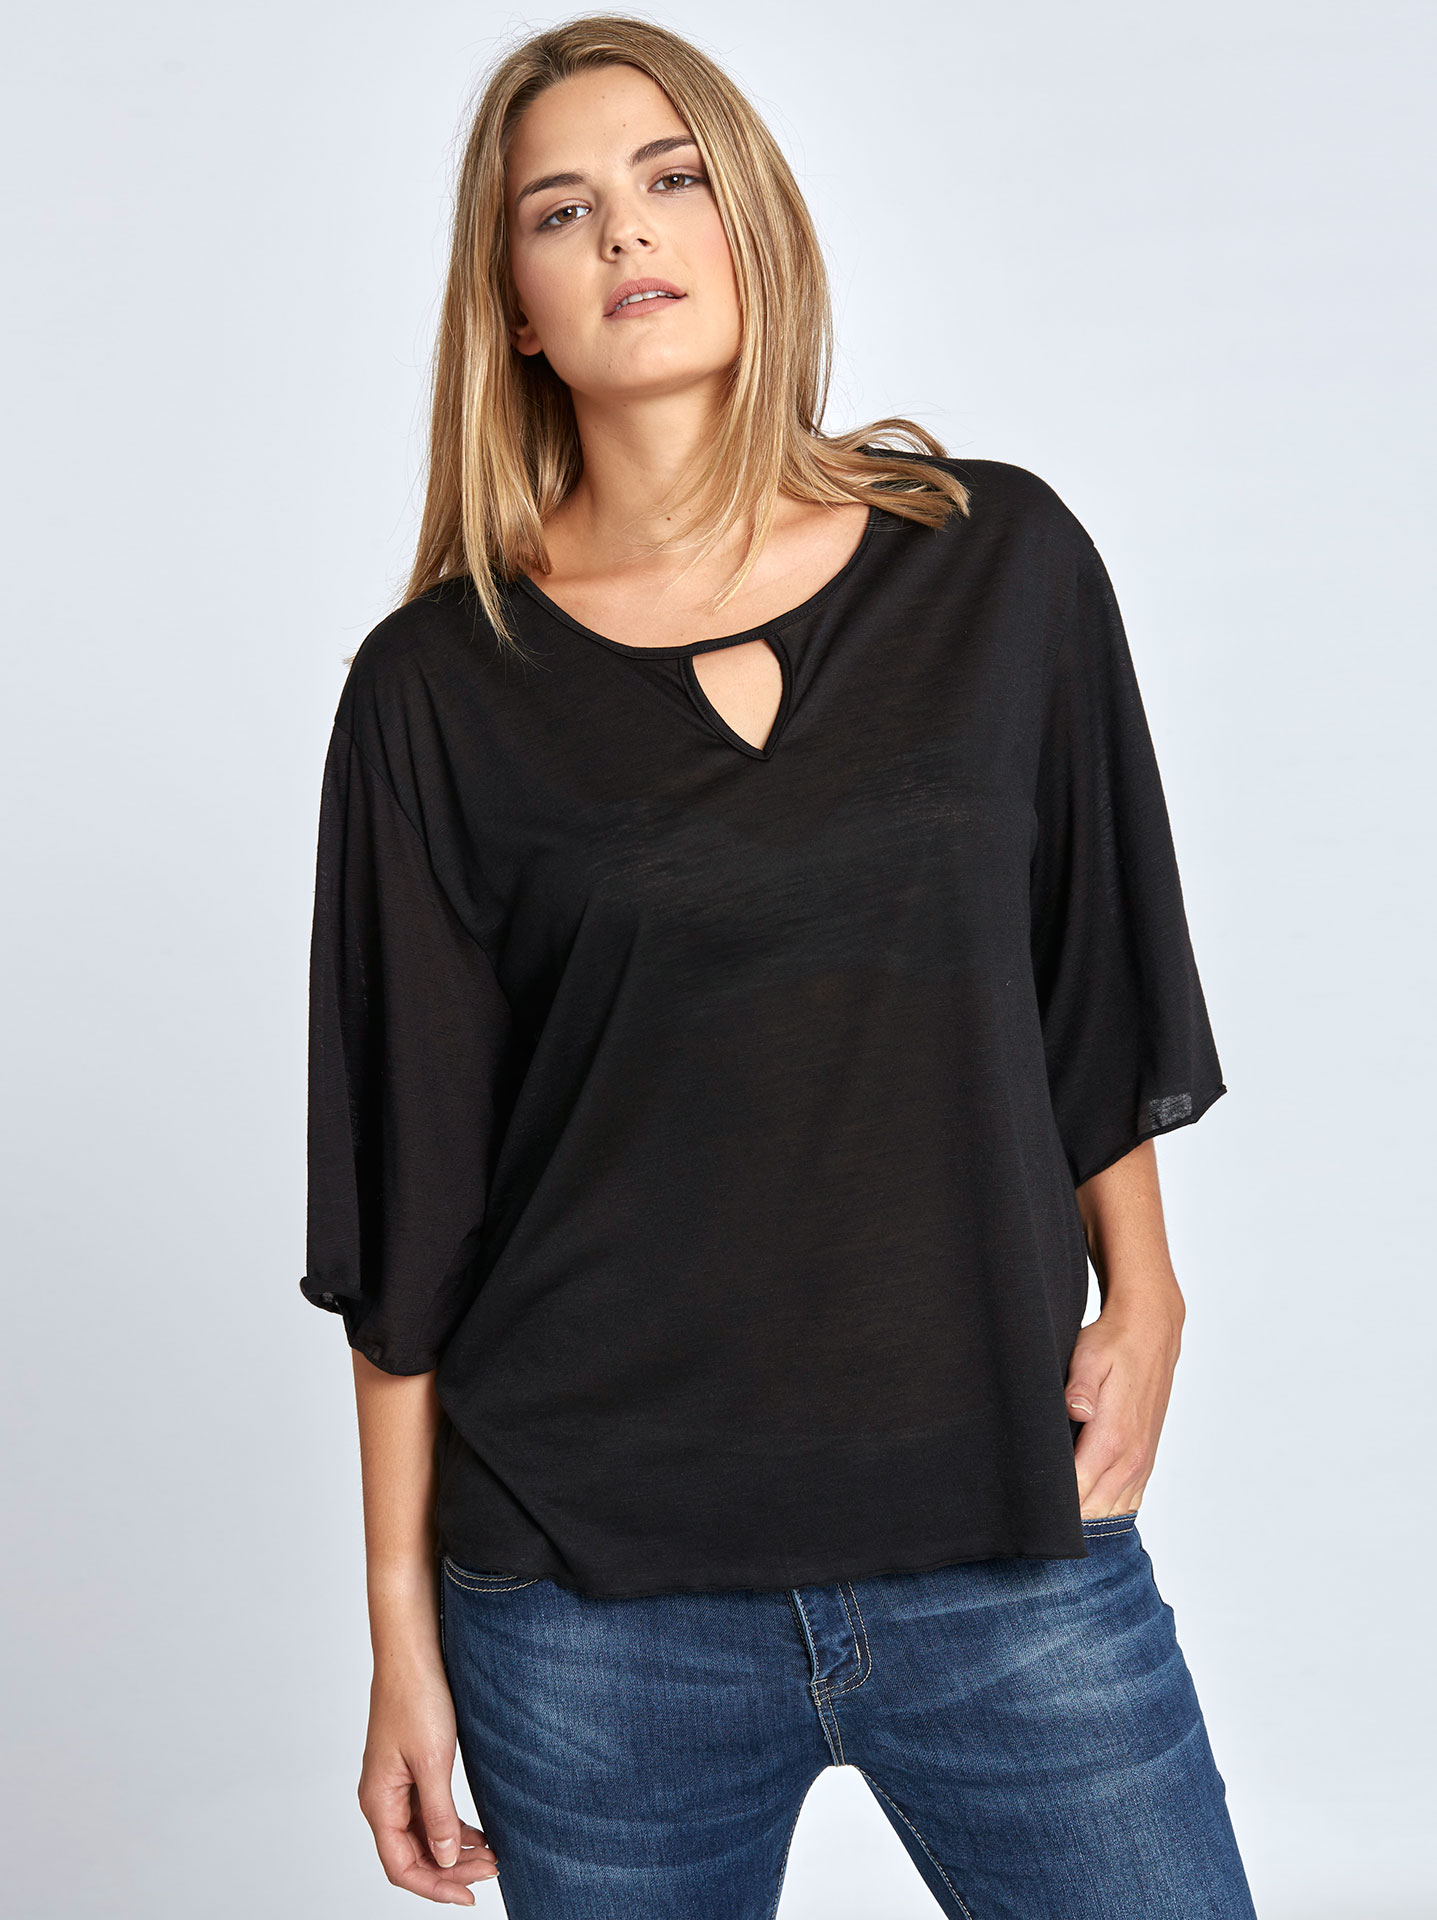 505bfca79b4e Plus size μπλούζα με άνοιγμα στη λαιμόκοψη curvy σε μαυρο